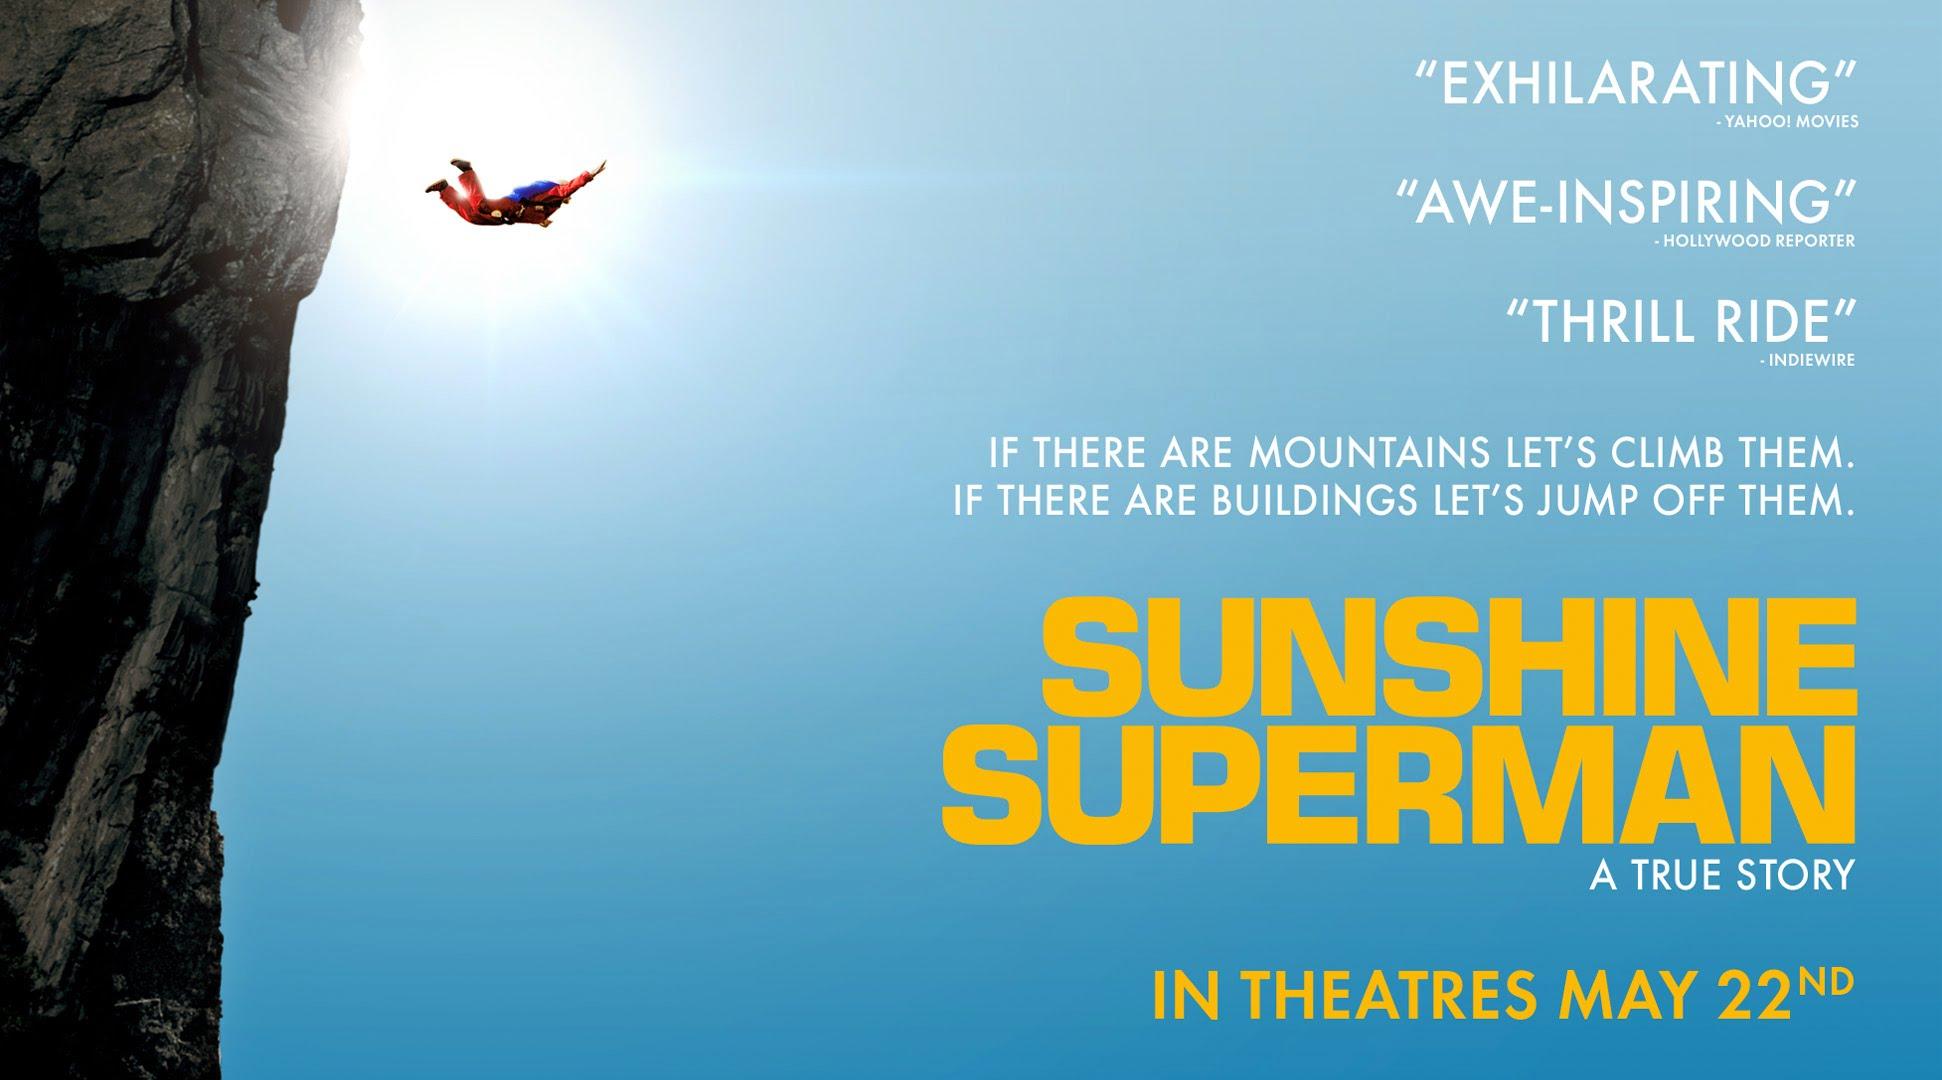 Sunshine Superman - Official Trailer - YouTube